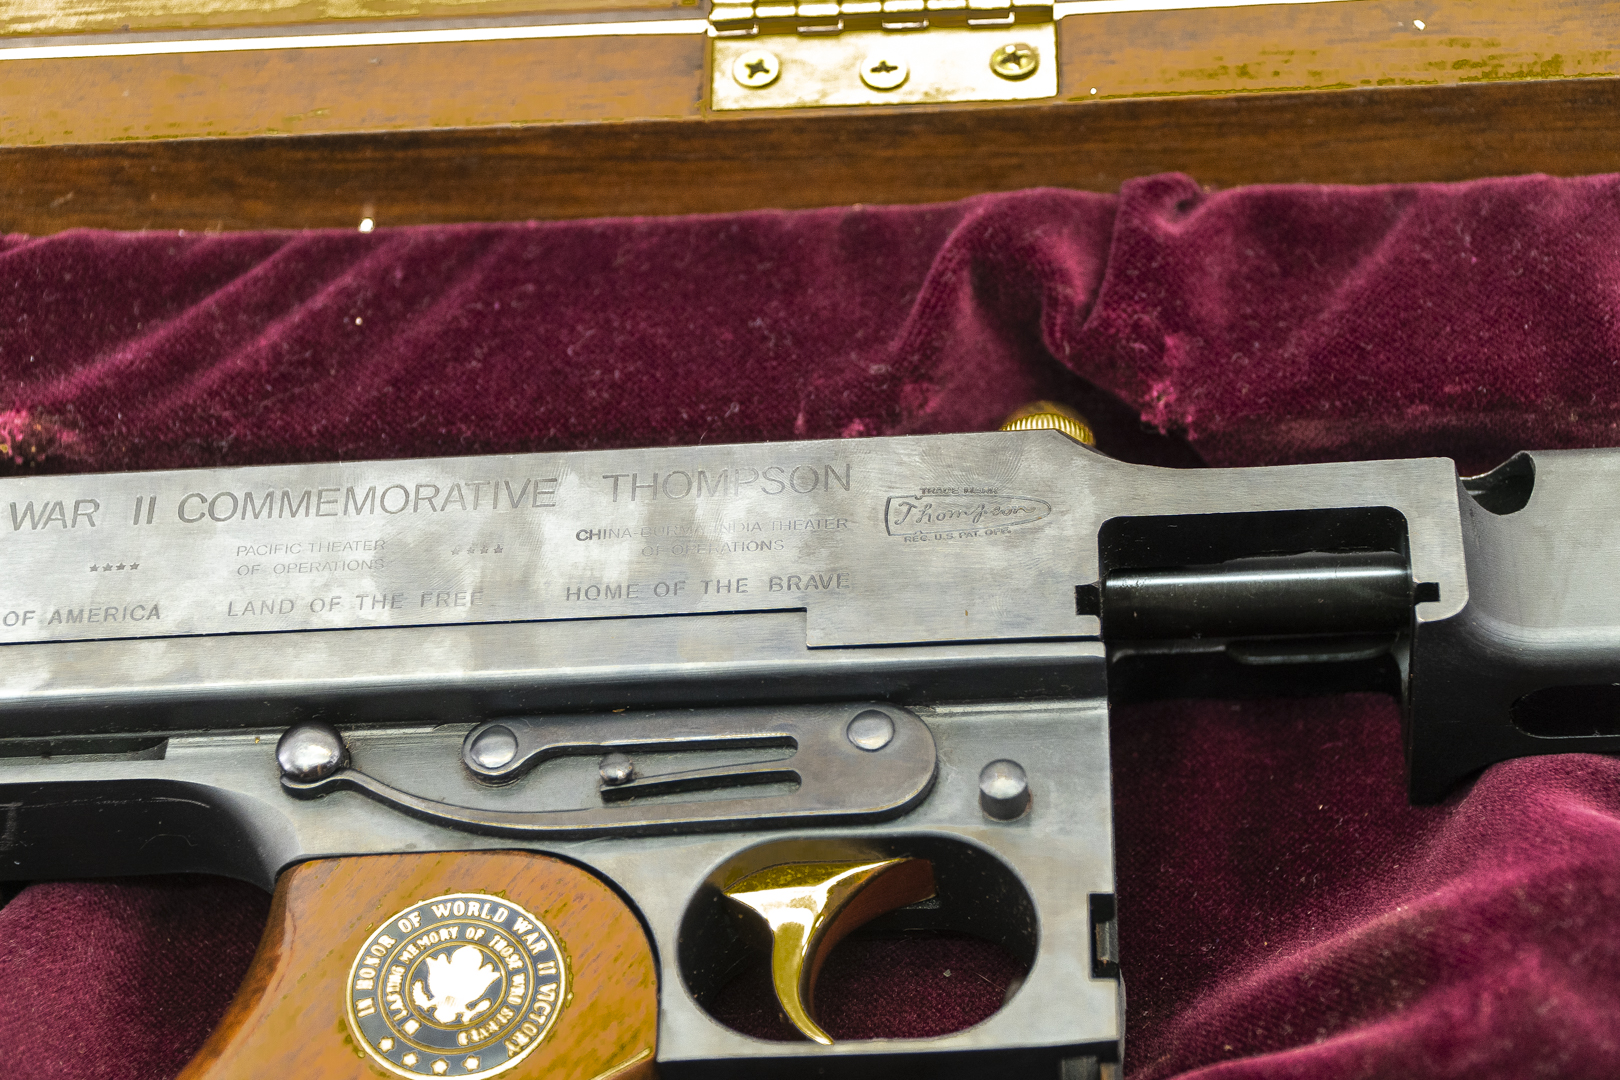 GunSpot | 1928 Commemorative WWII Thompson